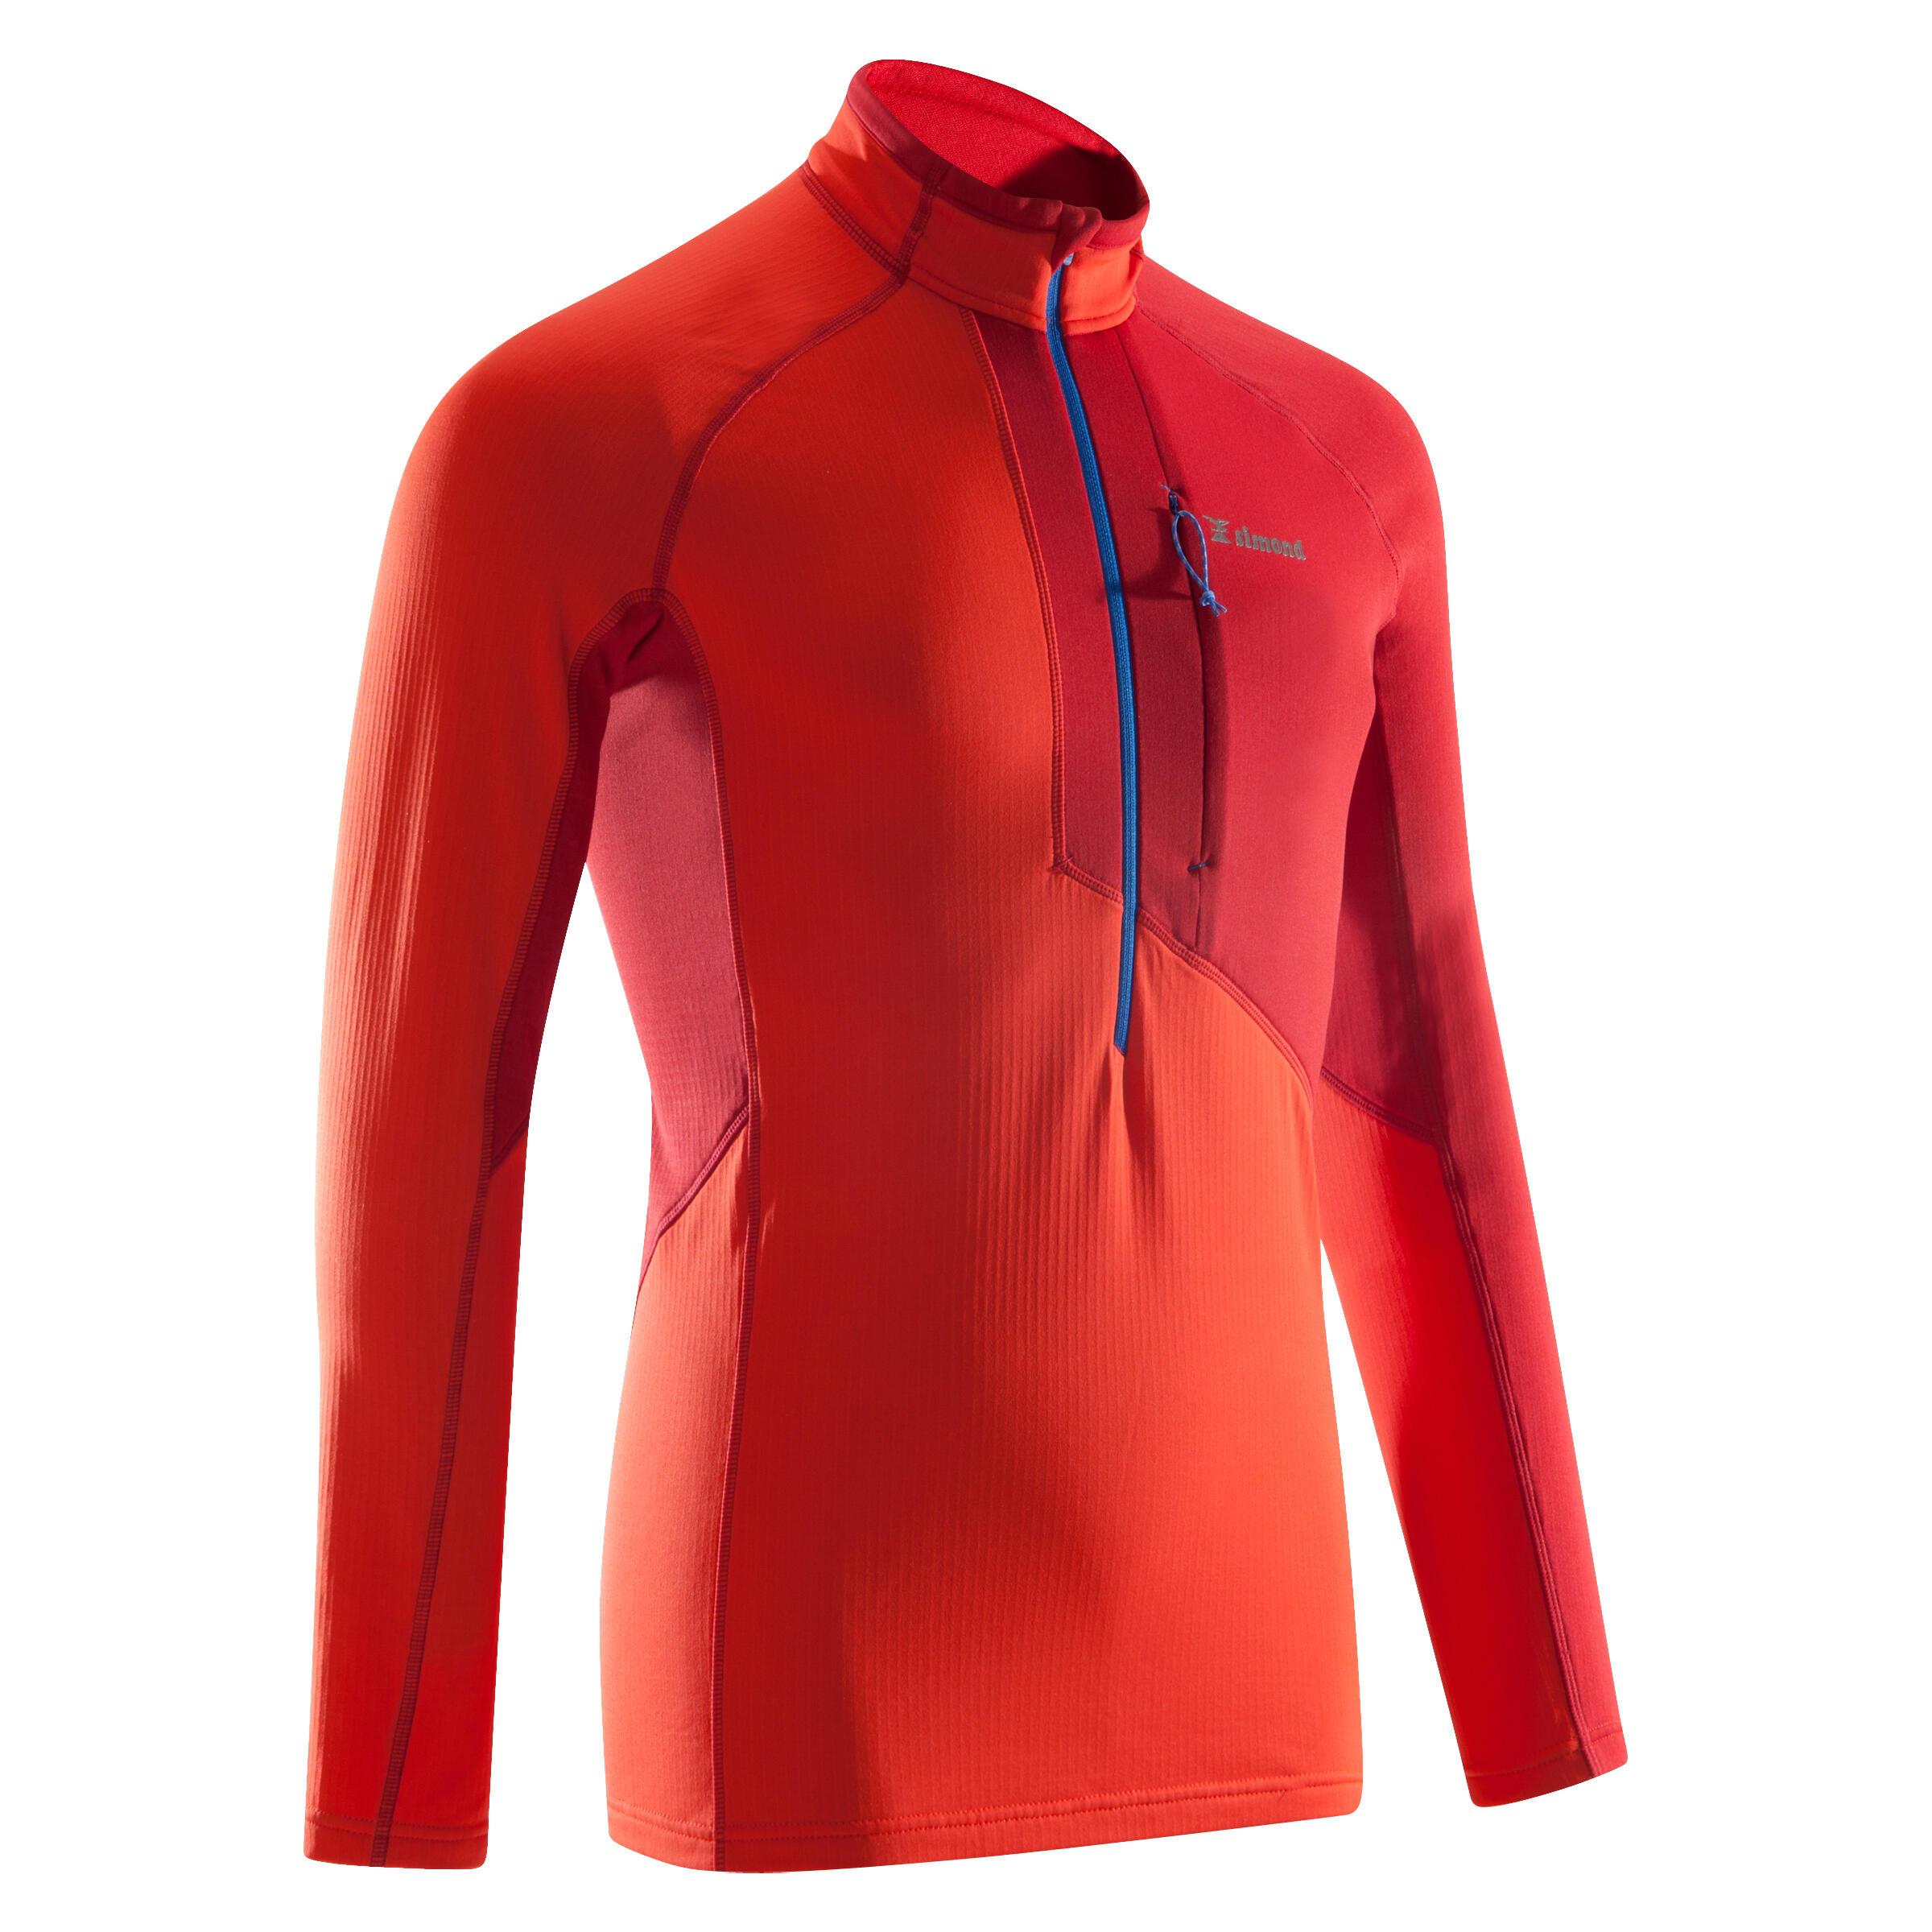 Klettershirt Simond Alpinism 1/2 Zip Sweatshirt Herrren rot/zinnoberrot   Sportbekleidung > Sportshirts > Klettershirts   Simond